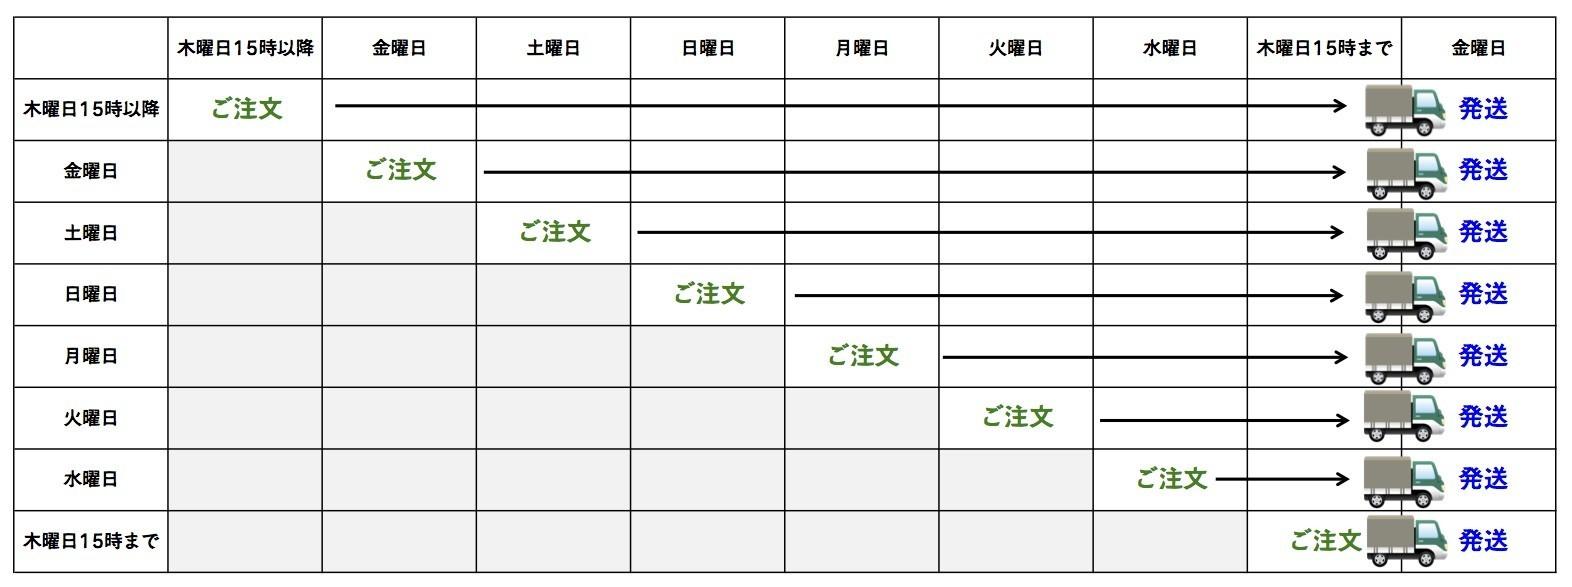 【Ratchet & Clank(ラチェット&クランク)】レコード - 画像4